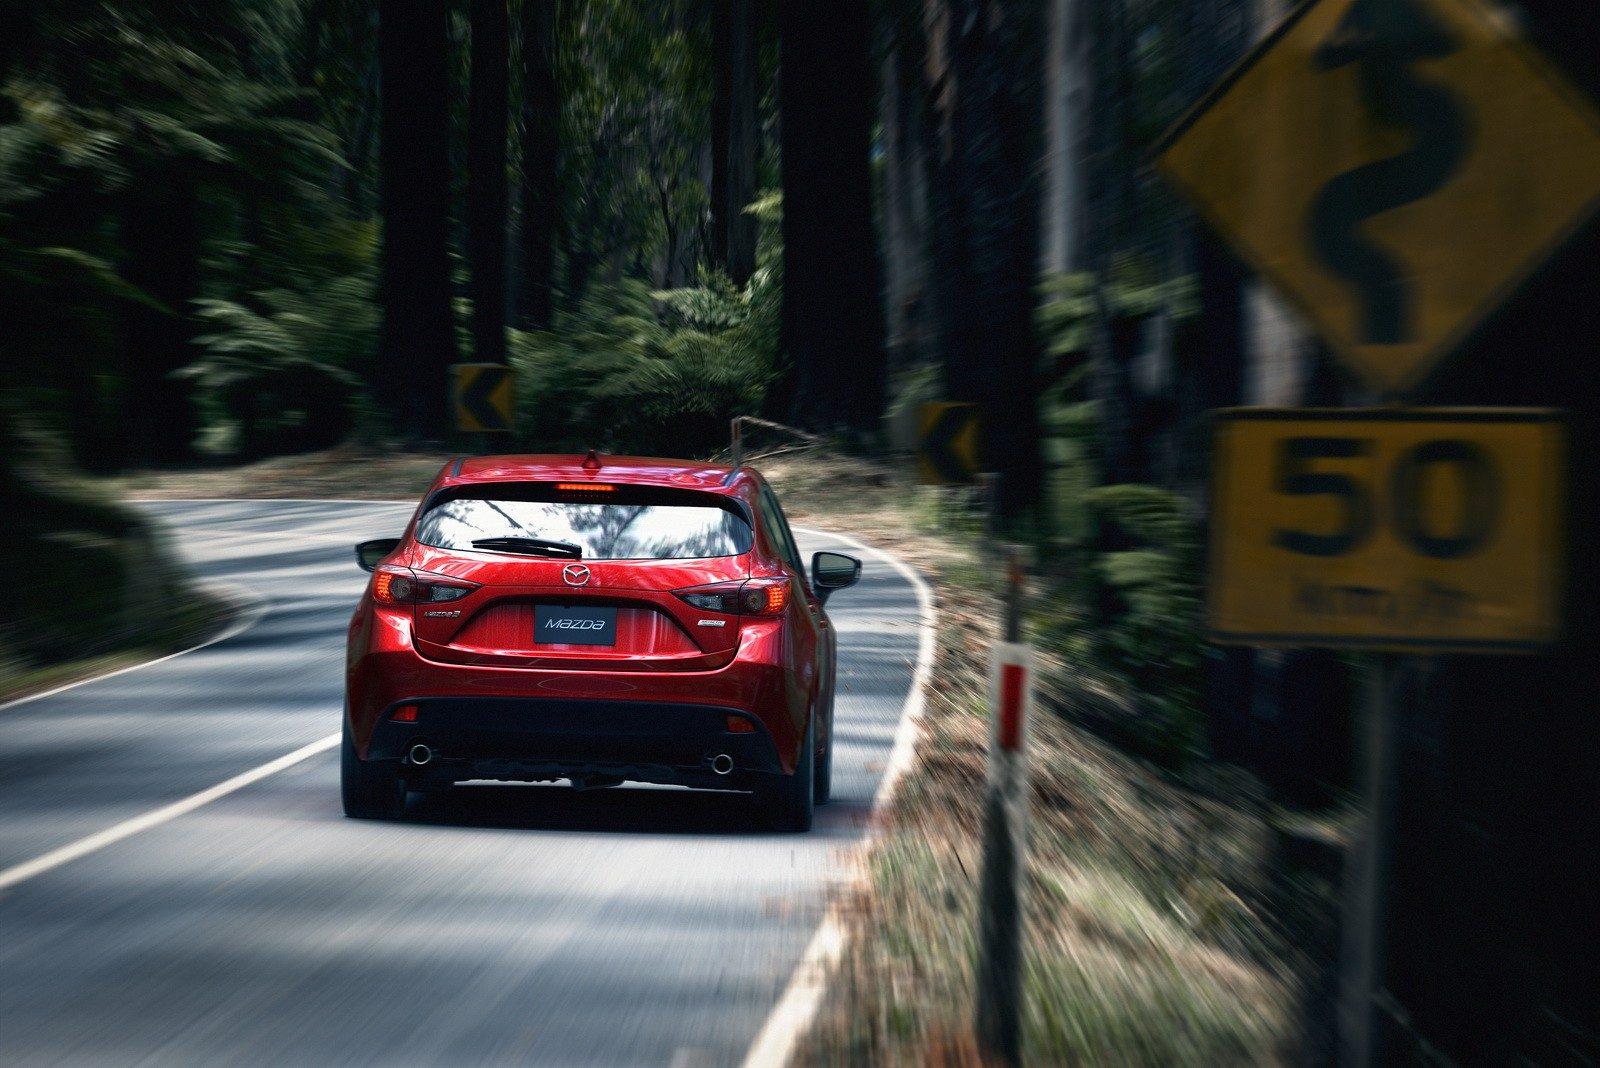 2014 Mazda3 5D NYC (27)